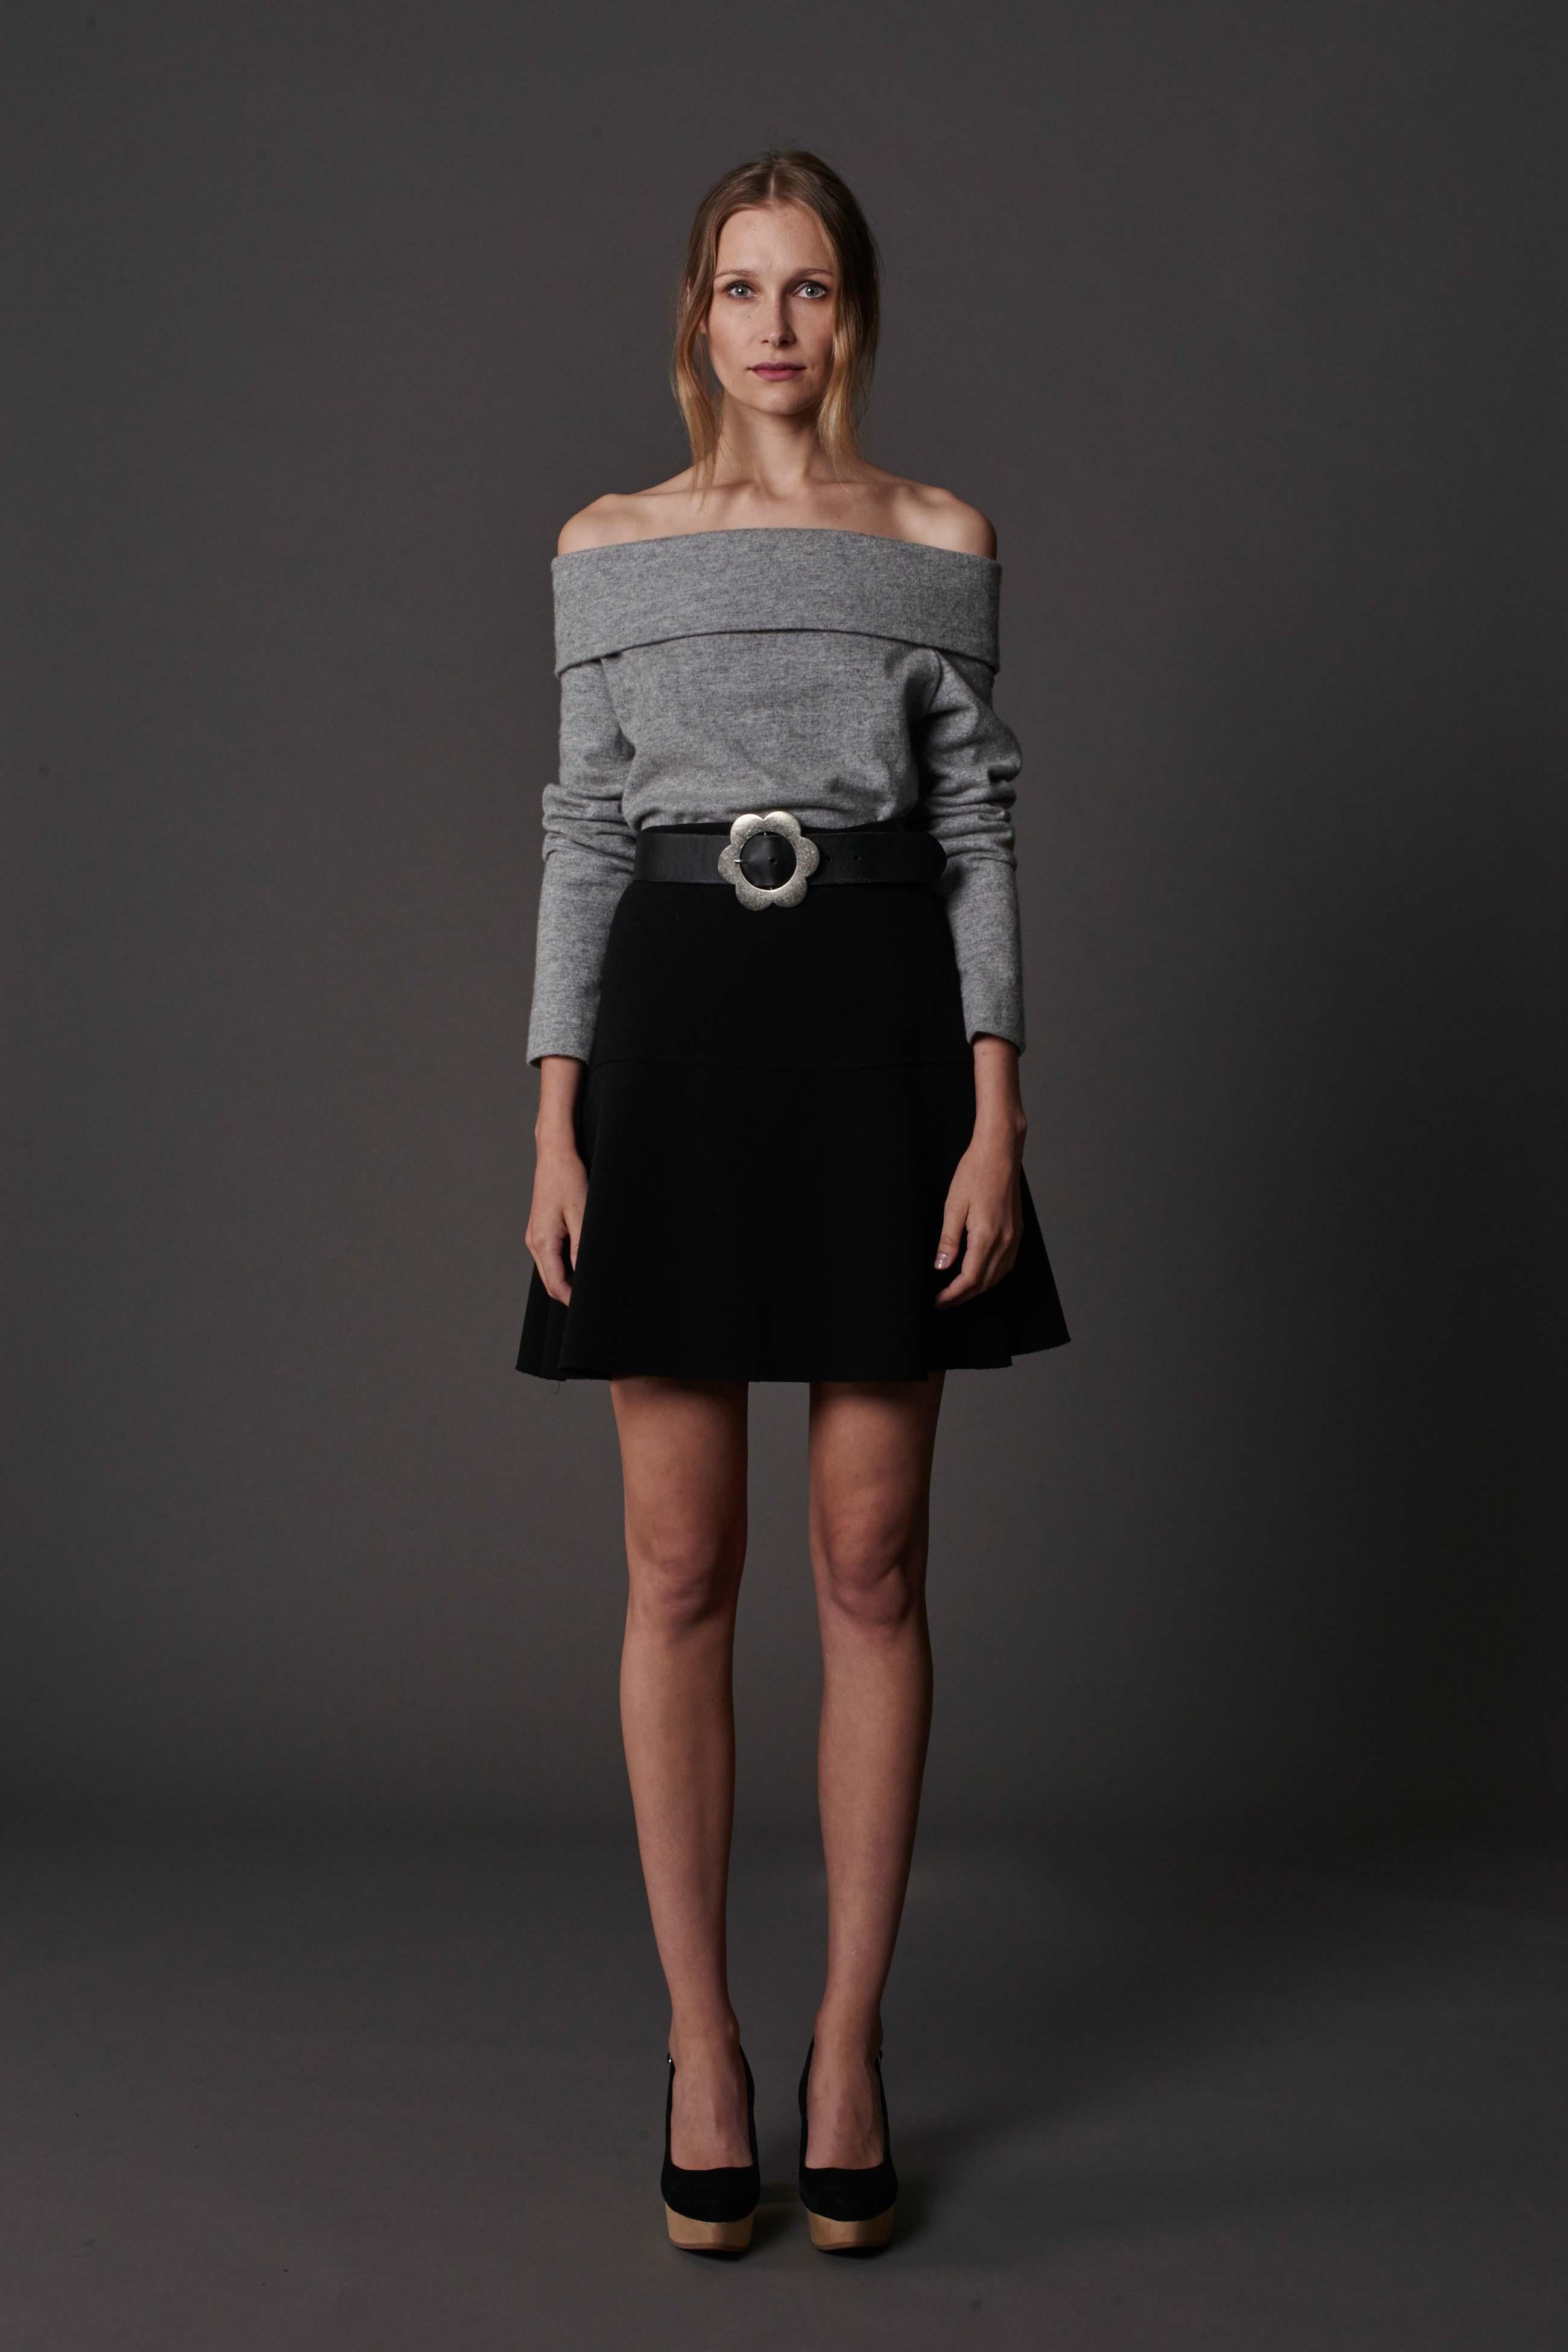 RUBY Alta Sweater, Ebony Skirt, Halo Belt & Halo Heel